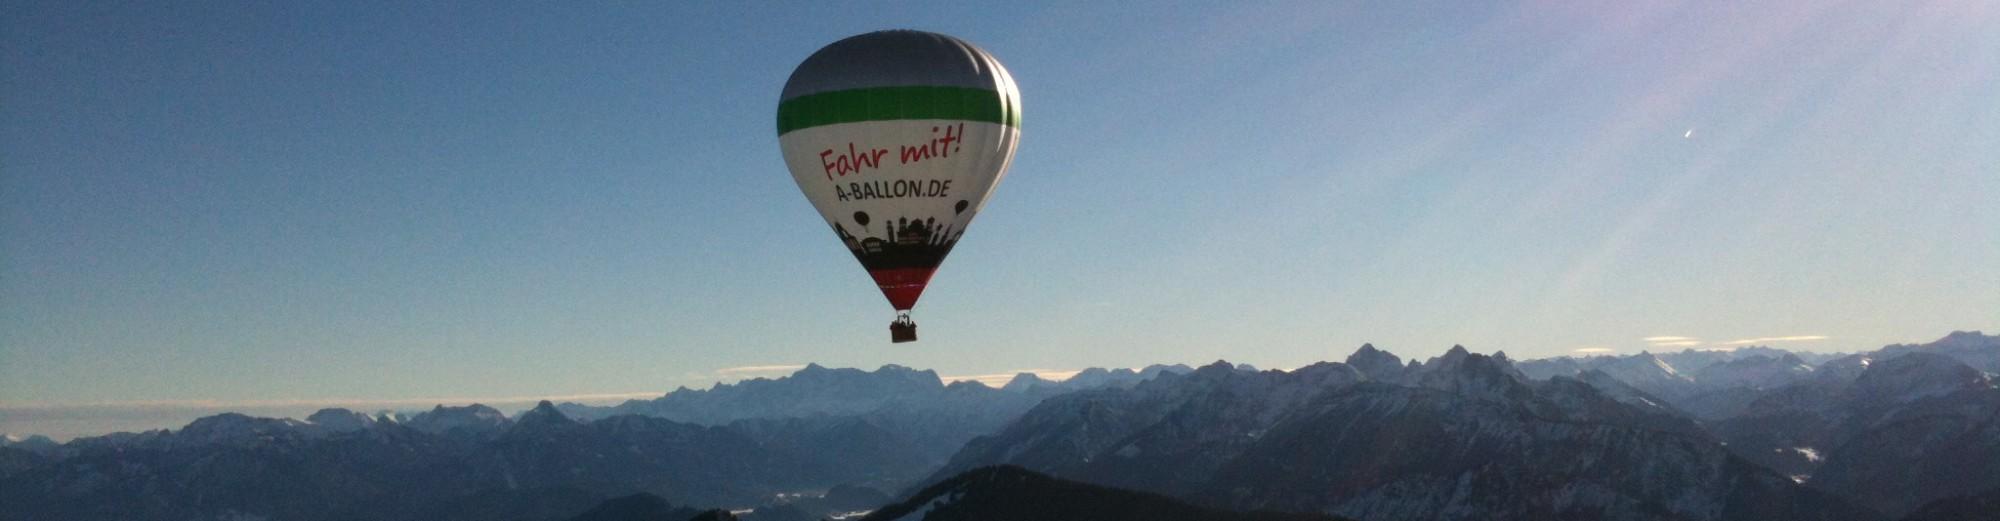 Alpen Ballonfahrten 2019